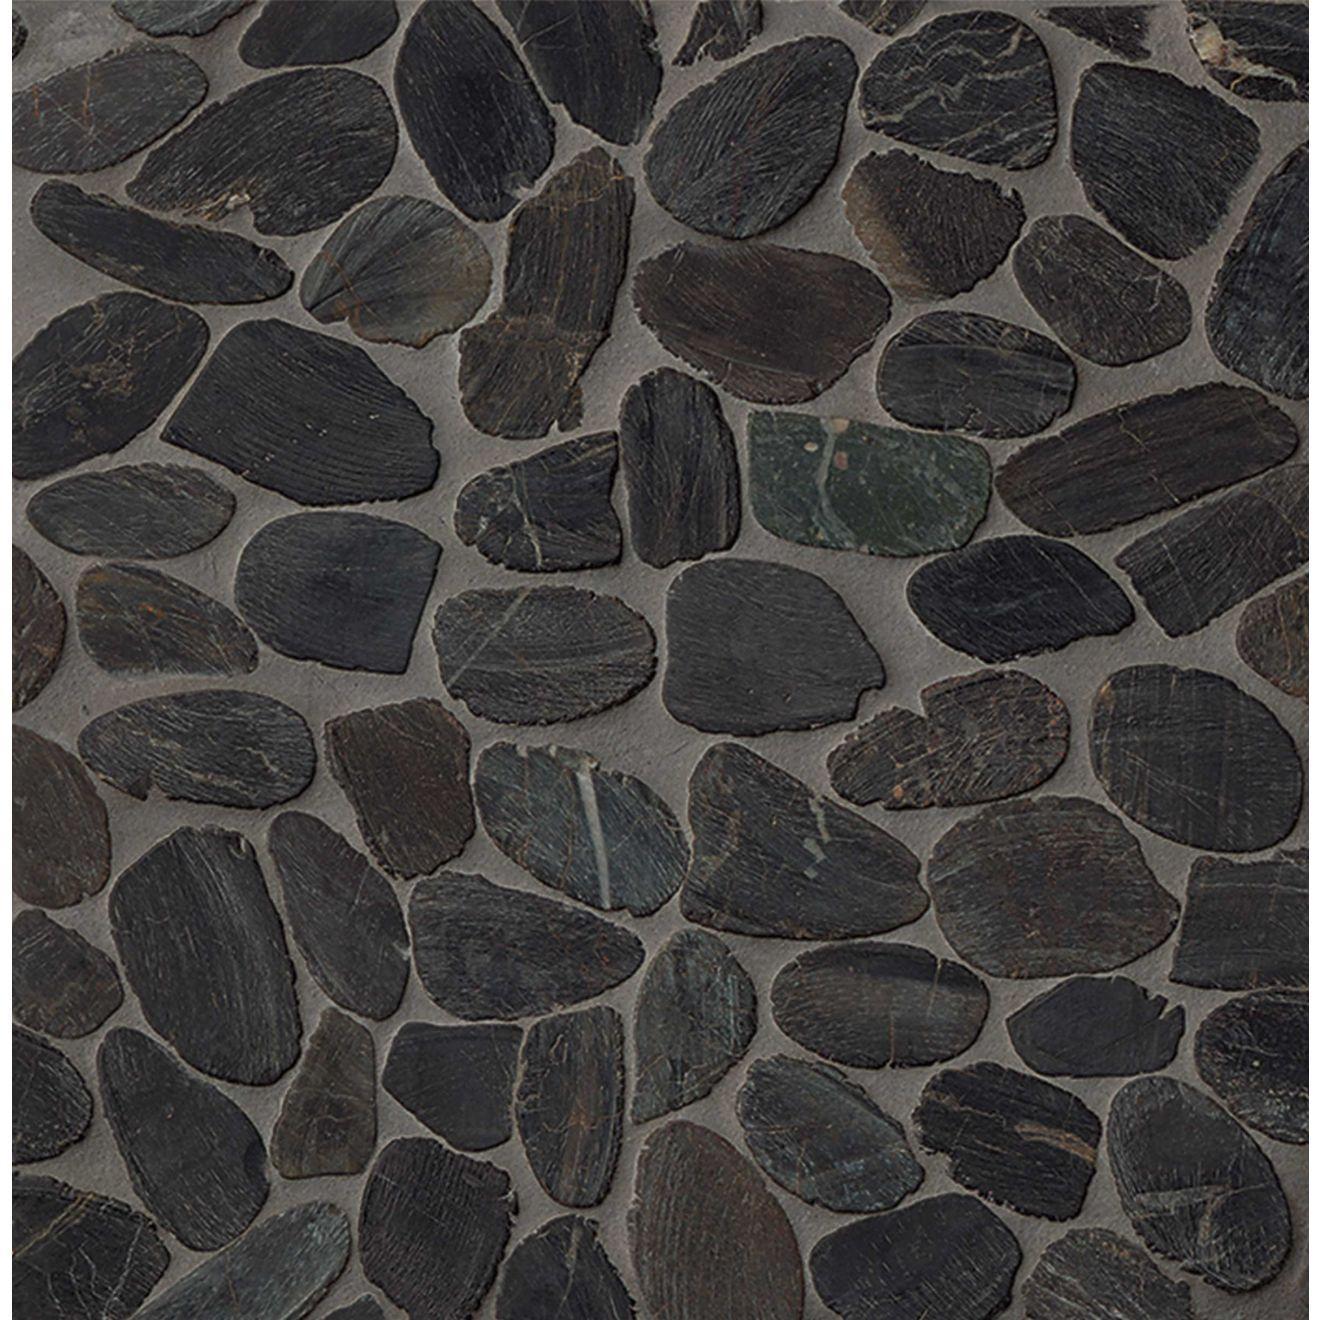 Hemisphere Polished Sliced Pebble Mosaic in Panther Black